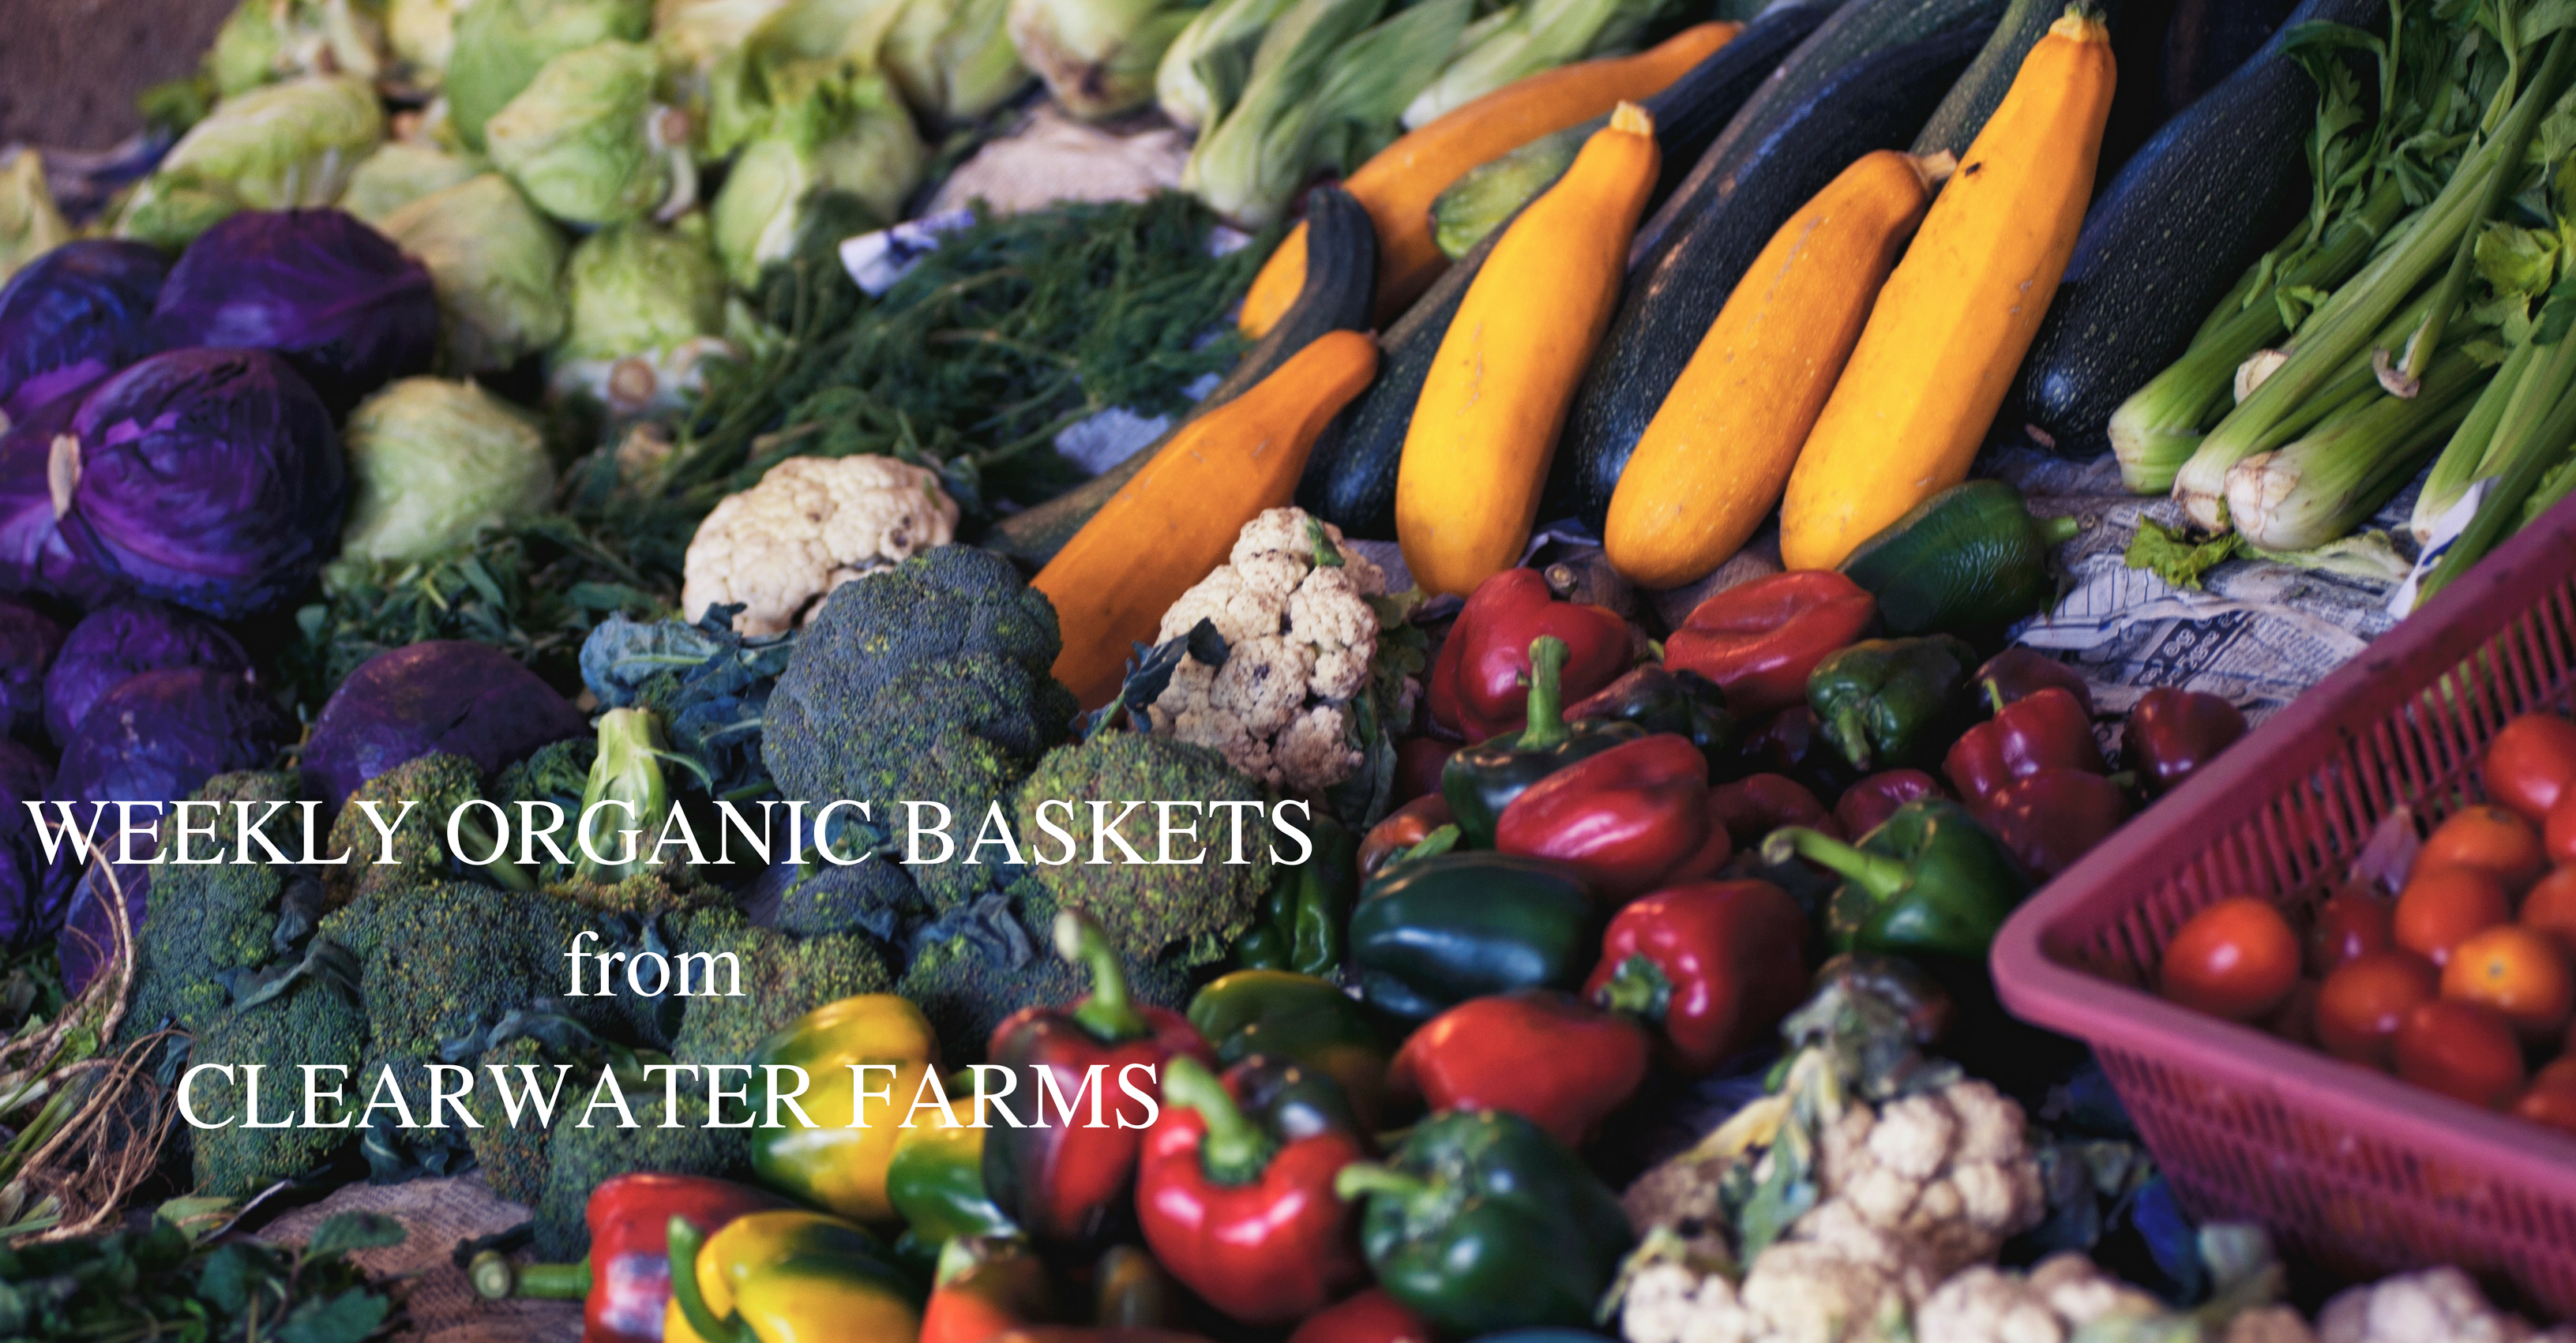 WeeklyOrganicBaskets_CSA_OrganicProduce